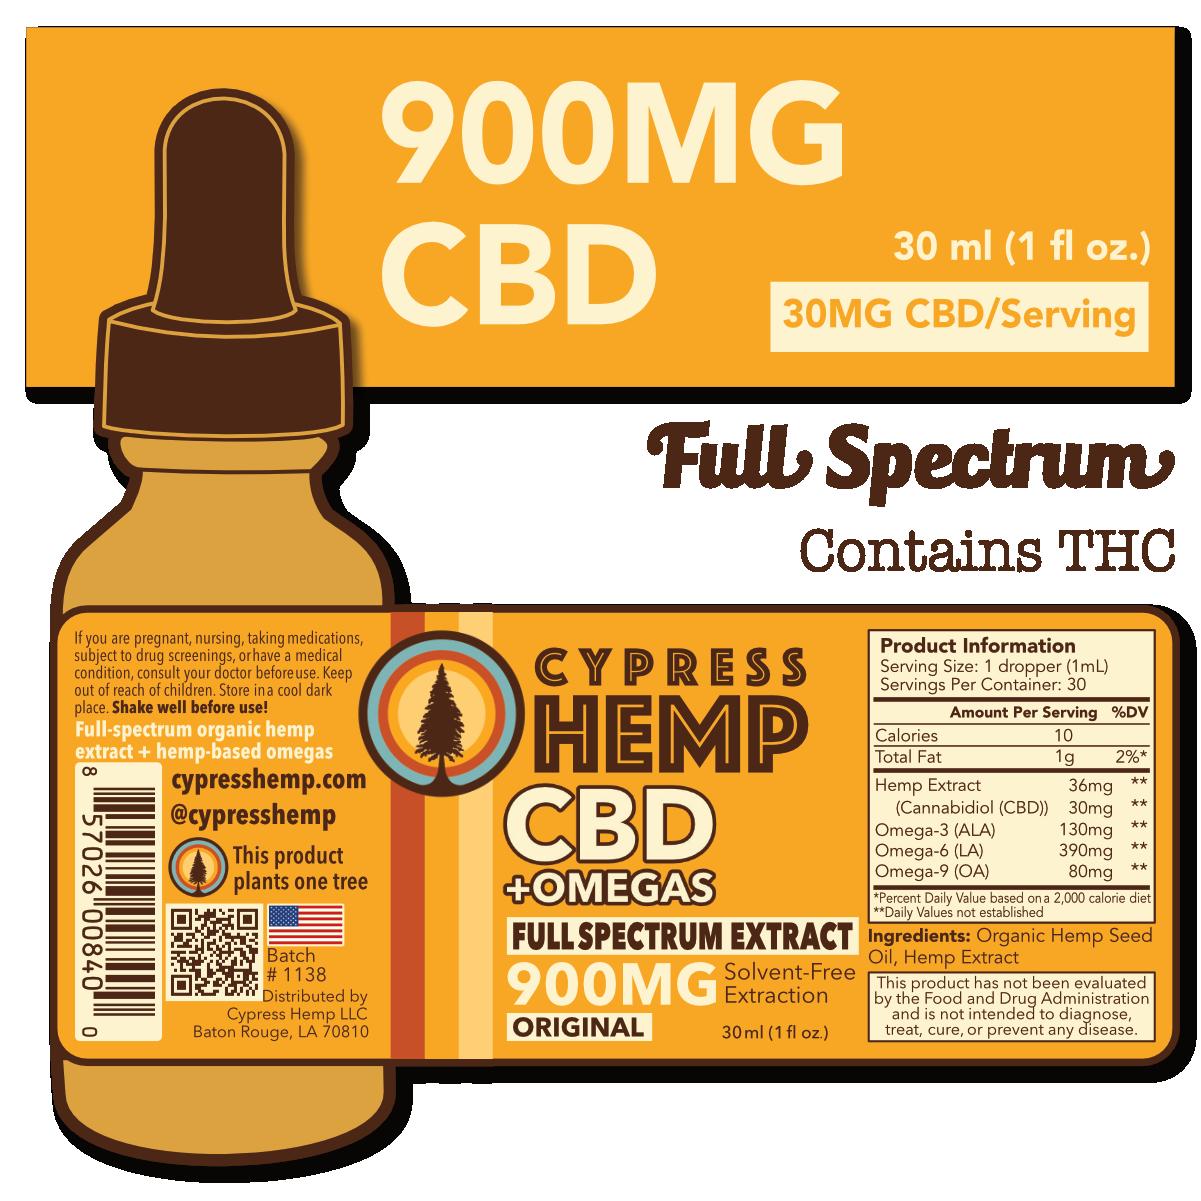 Cypress Hemp Full Spectrum 900mg CBD Drops